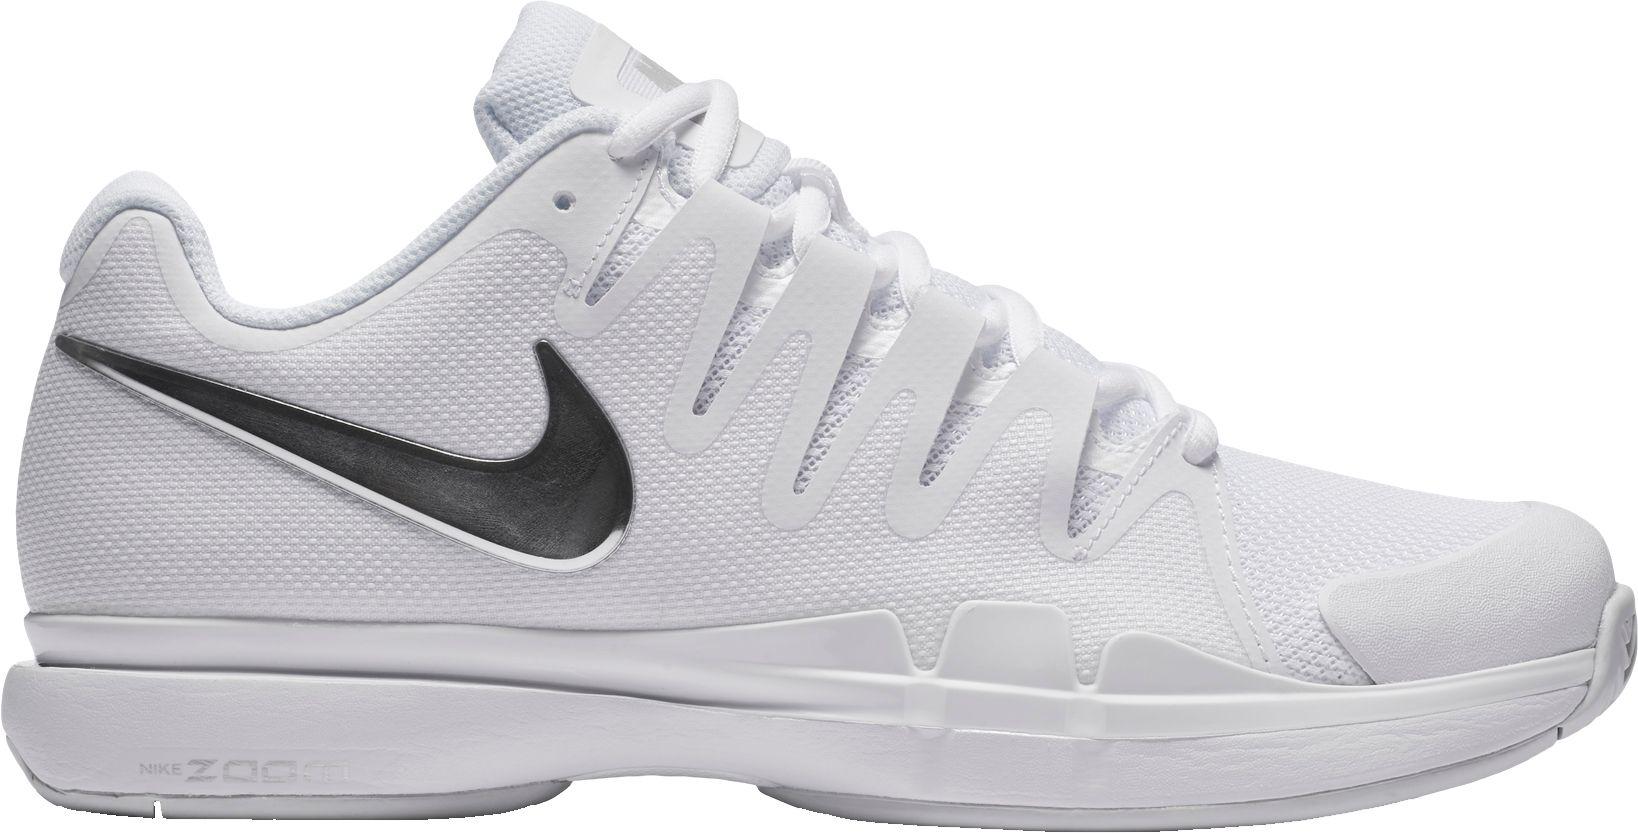 Product Image � Nike Women\u0027s Zoom Vapor 9.5 Tennis Shoes